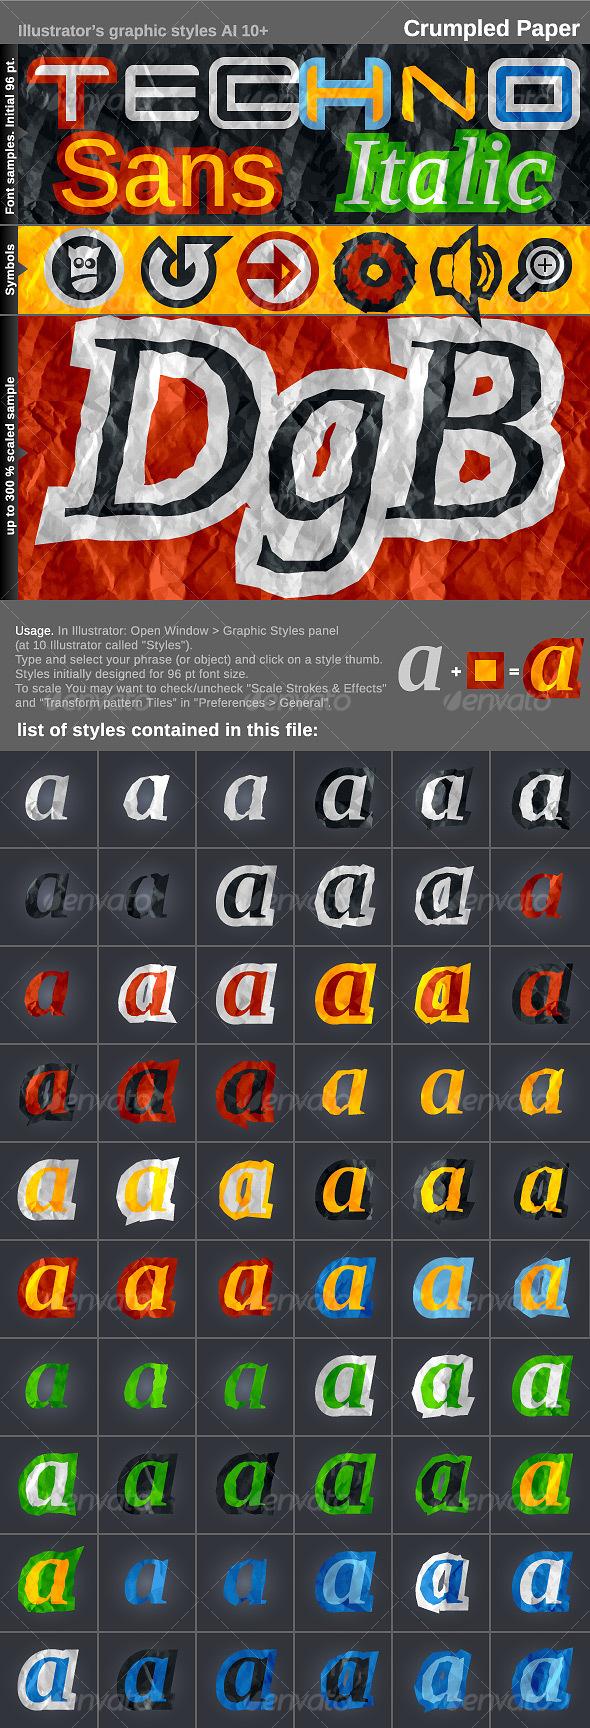 GraphicRiver Illustrator's styles AI CS& Crumpled Paper 101893